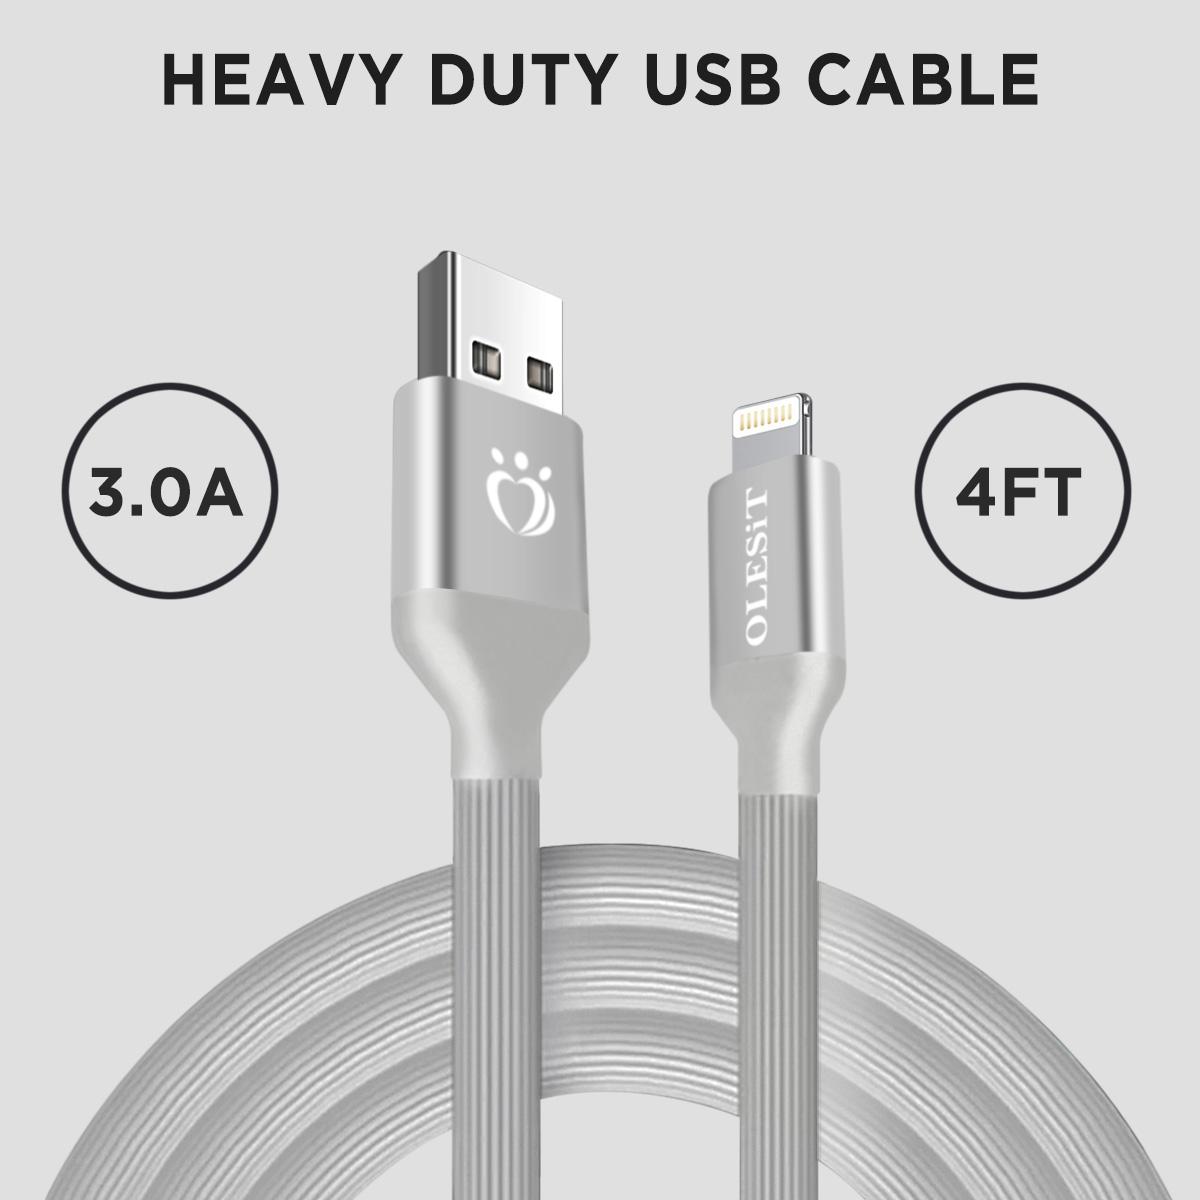 4FT-OLT-TPE-HD-USB-IP-WT